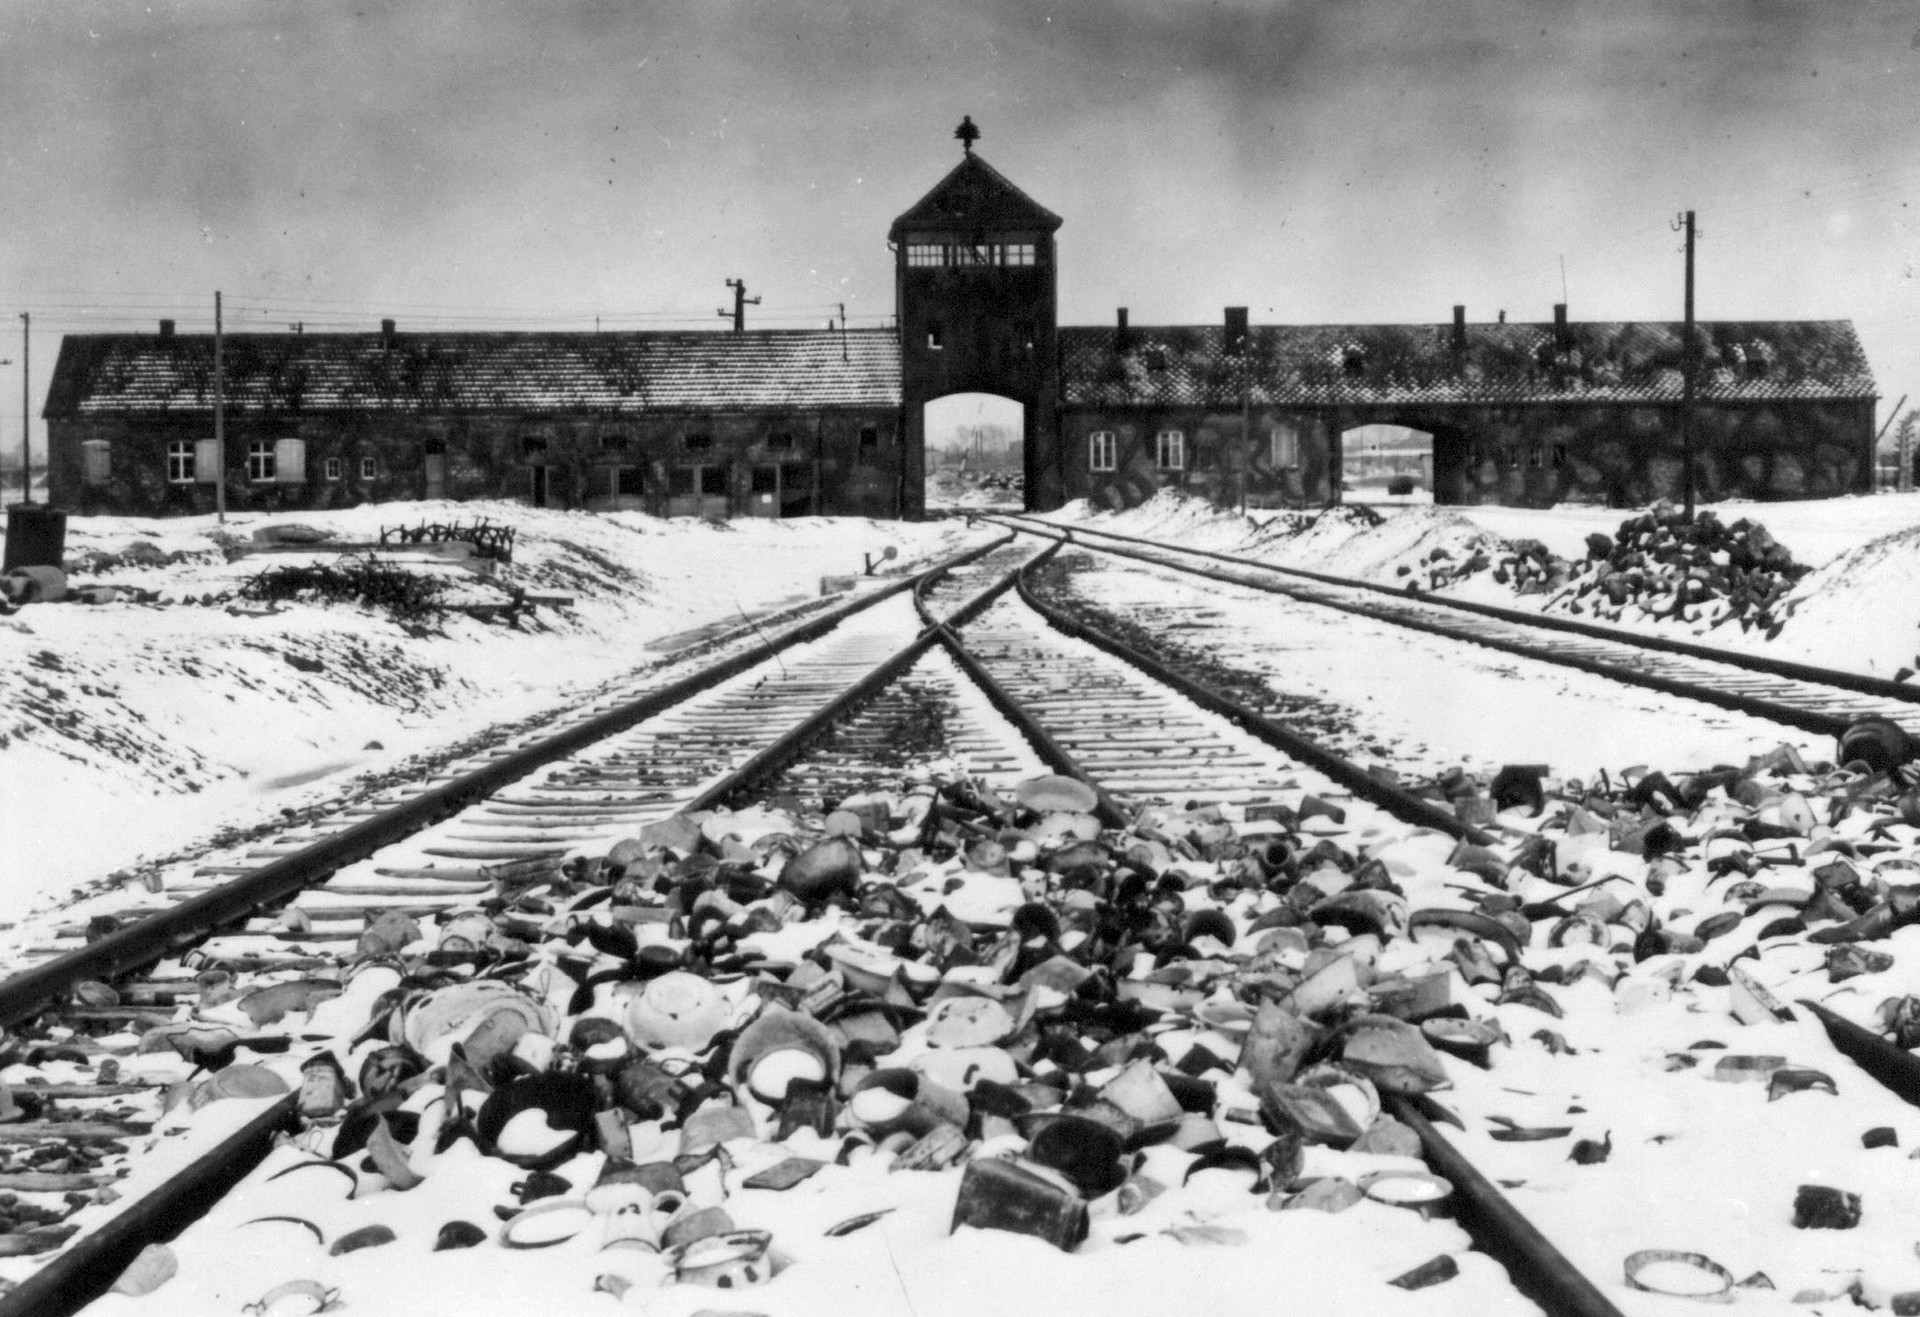 La llamada 'puerta de la muerte' de Auschwitz-Birkenau